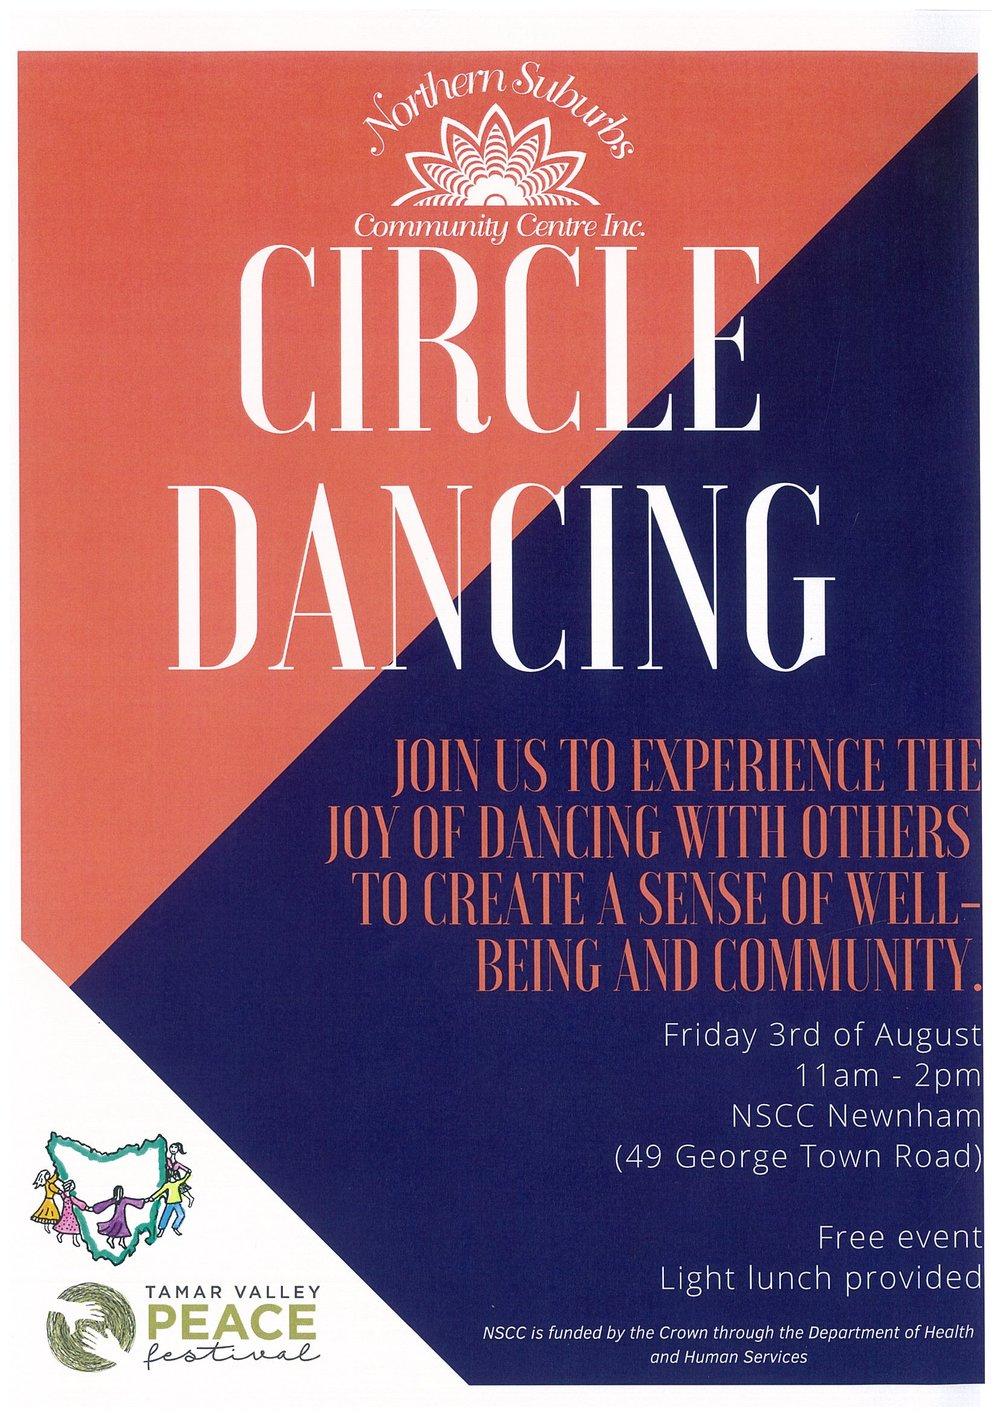 circle dancing jpeg.jpg